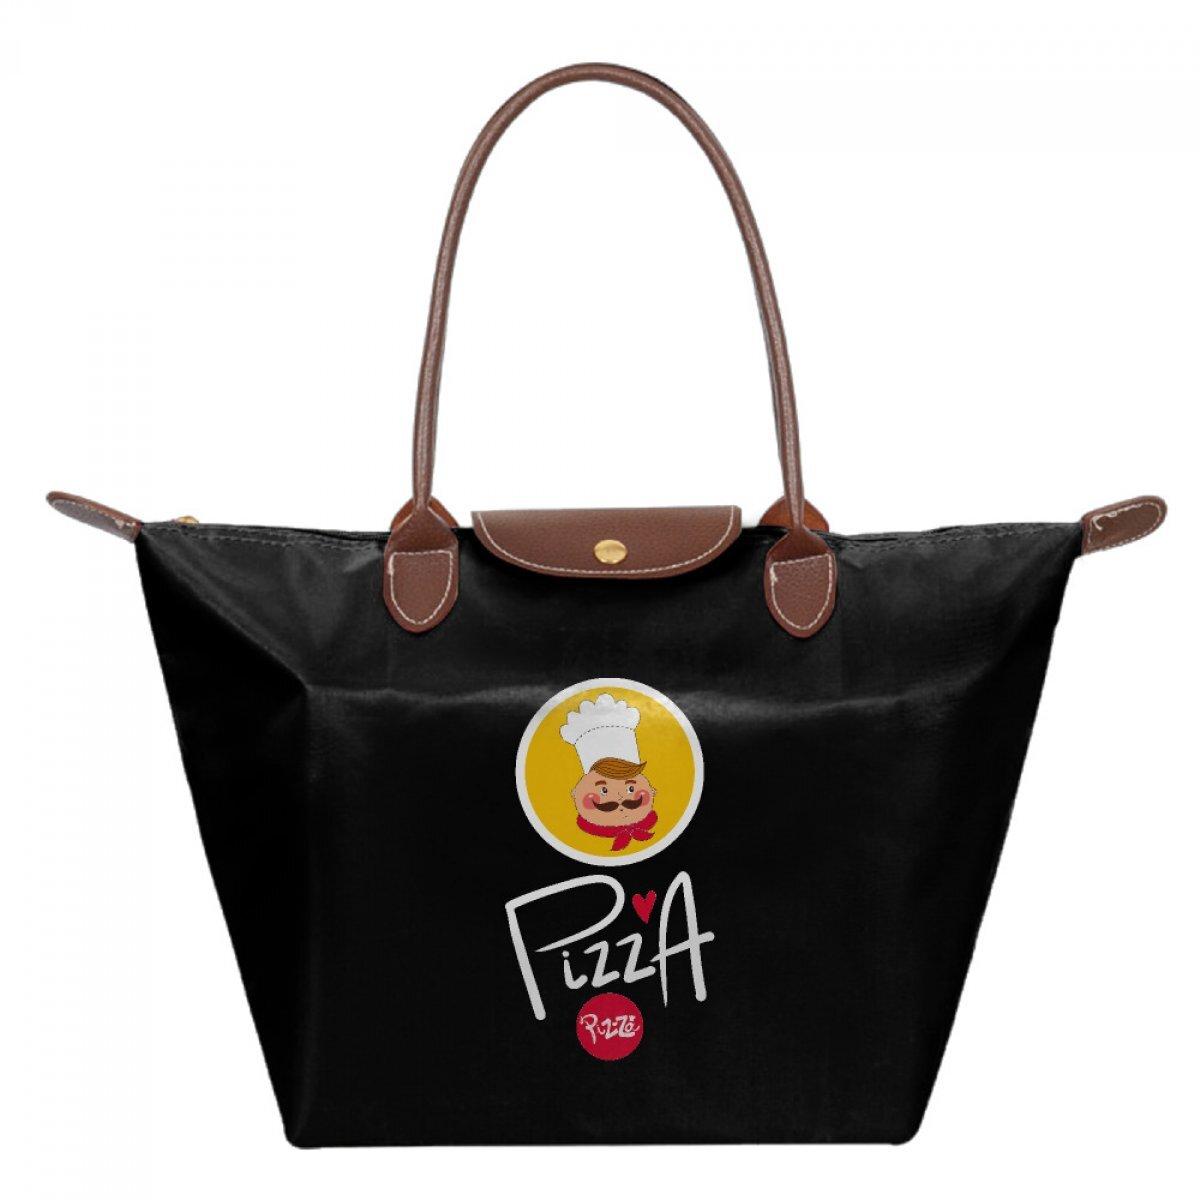 PhoRock Foldable Tote Shoulder Bags Women Shoping Bag Waterproof Nylon Dumpling Dessert Printed Bag JZMS007 0